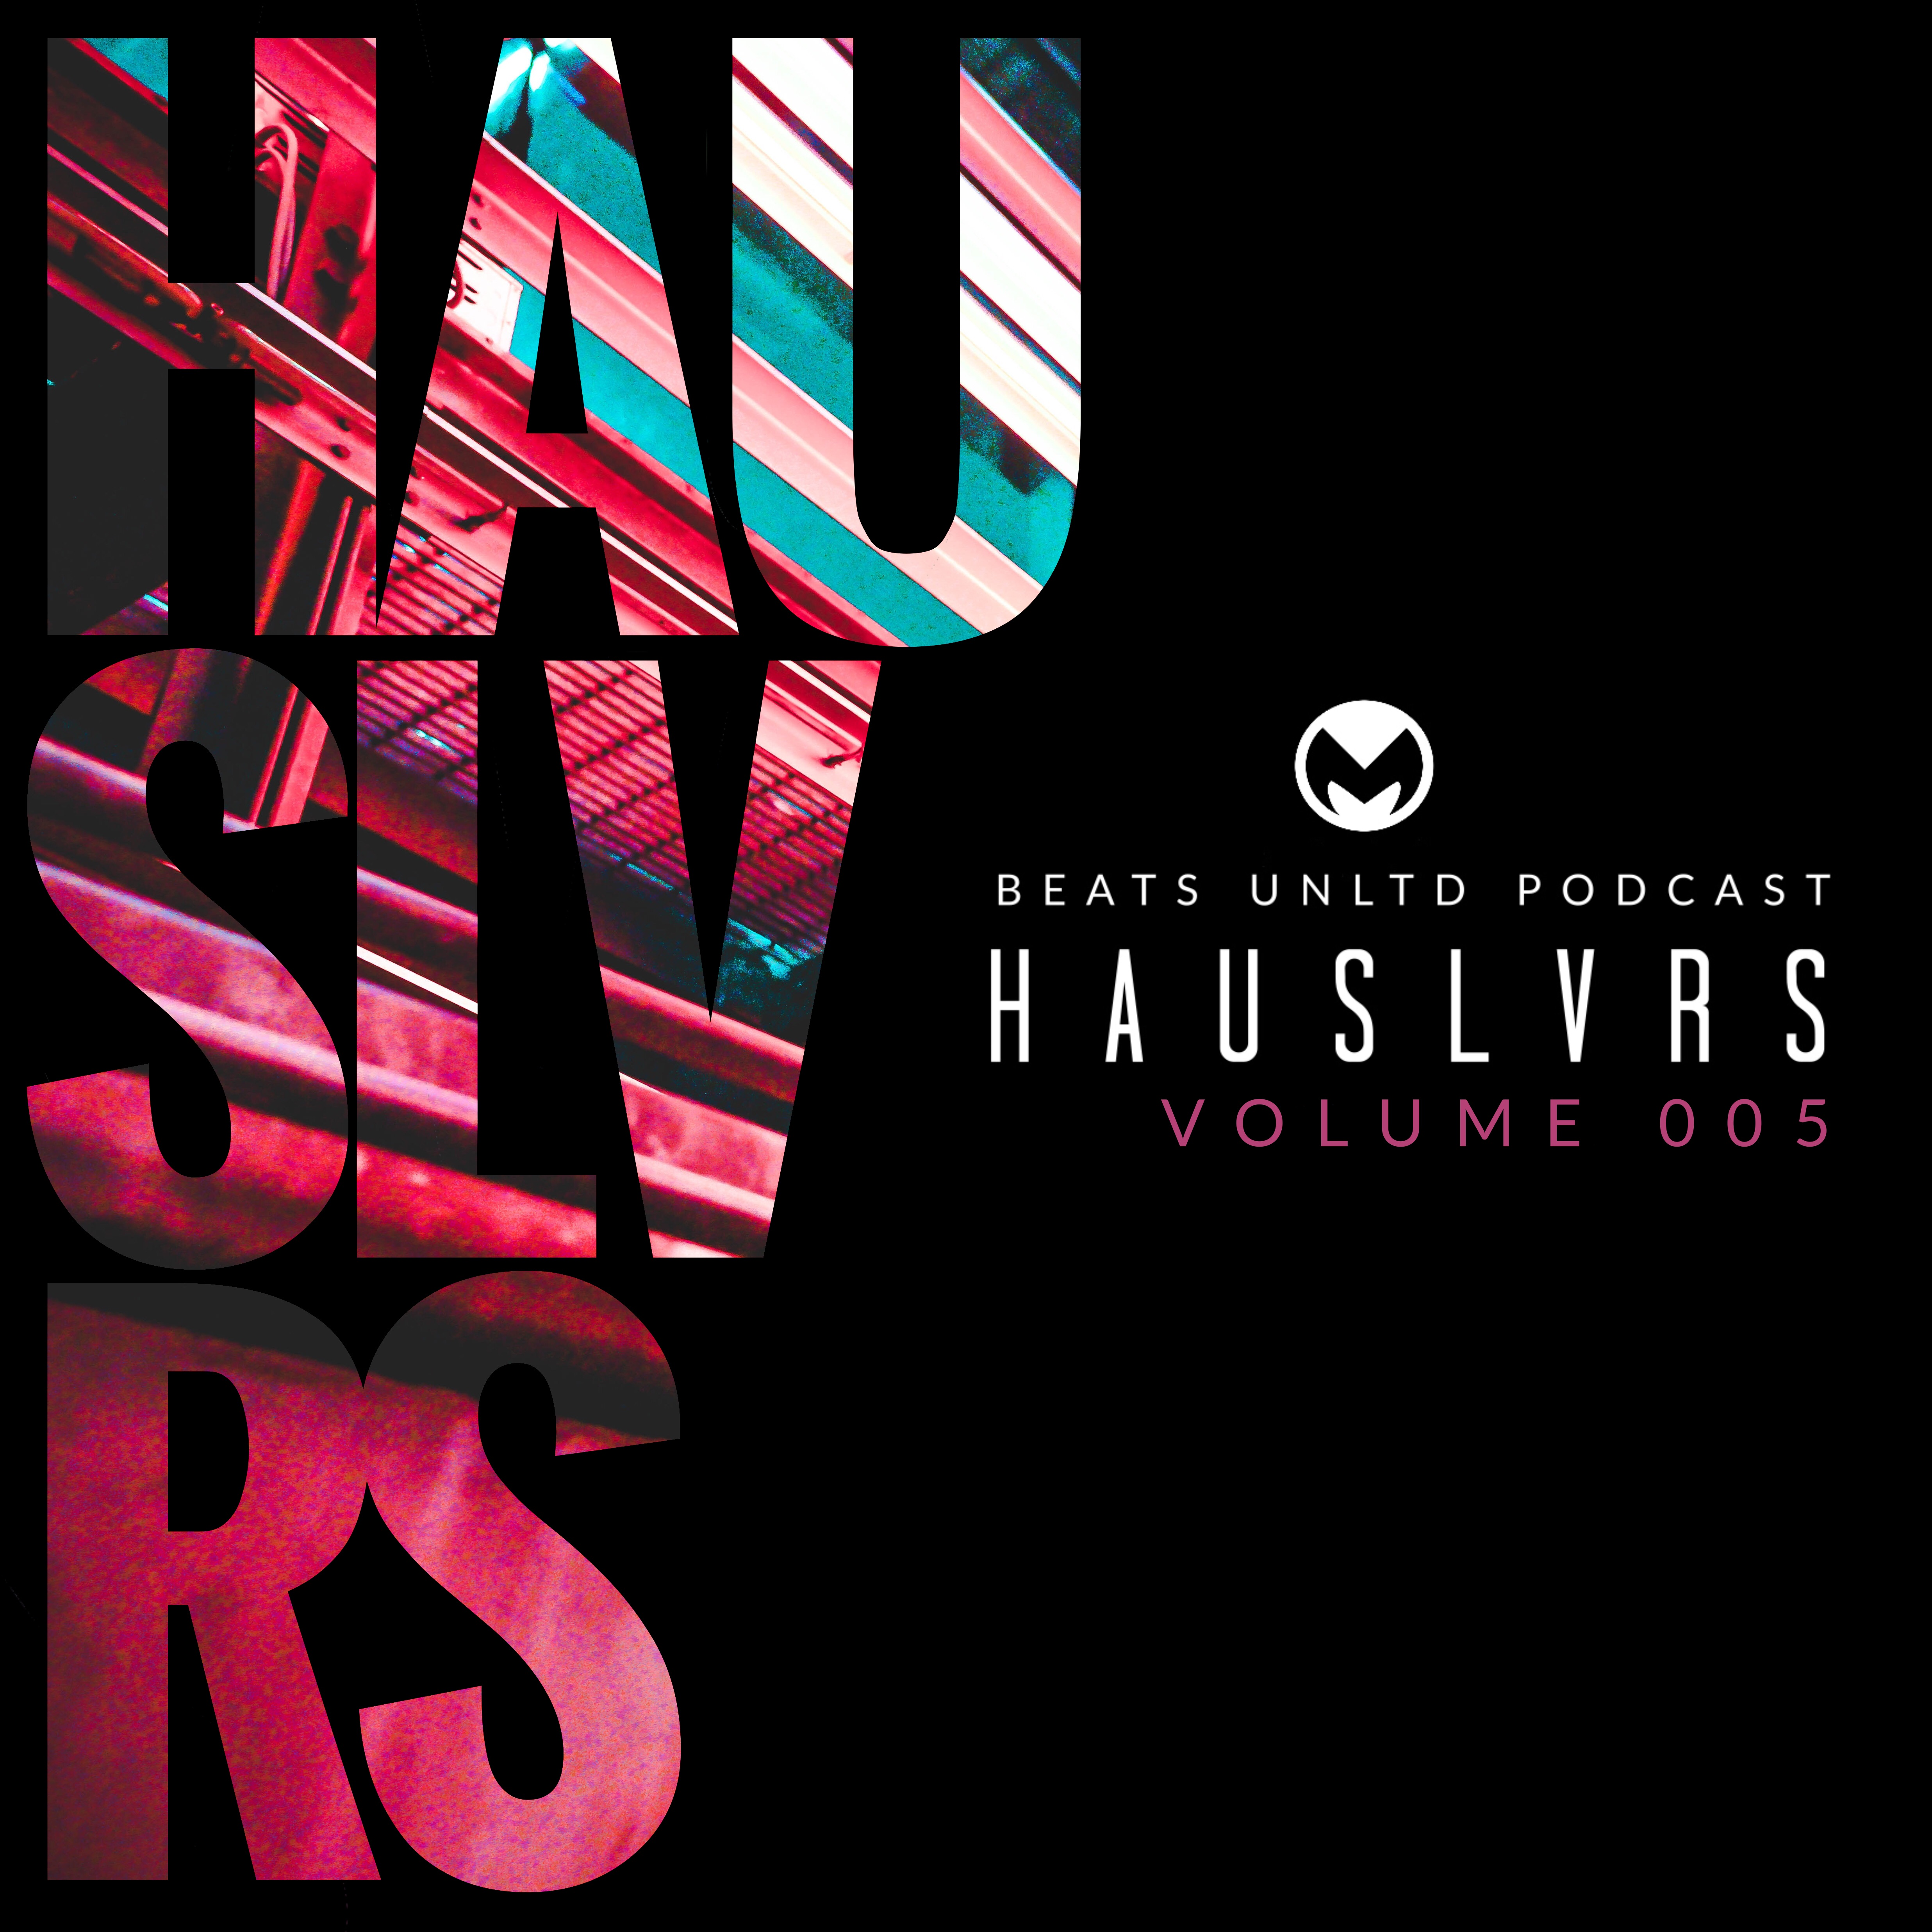 240 HausLvrs Volume 005